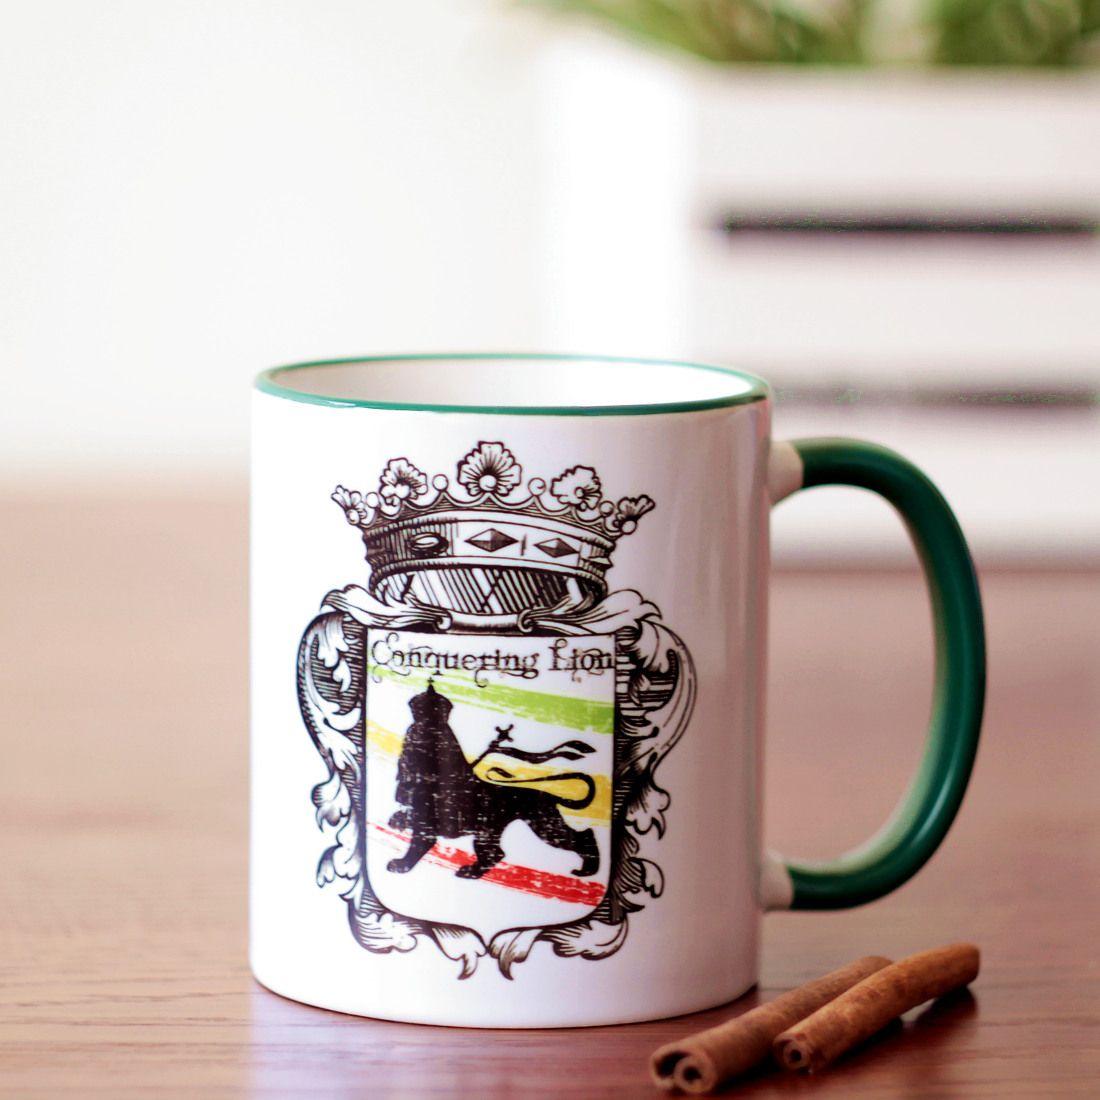 Rasta Accessories » Mugs & Cups » Conquering Lion Coffee Mug